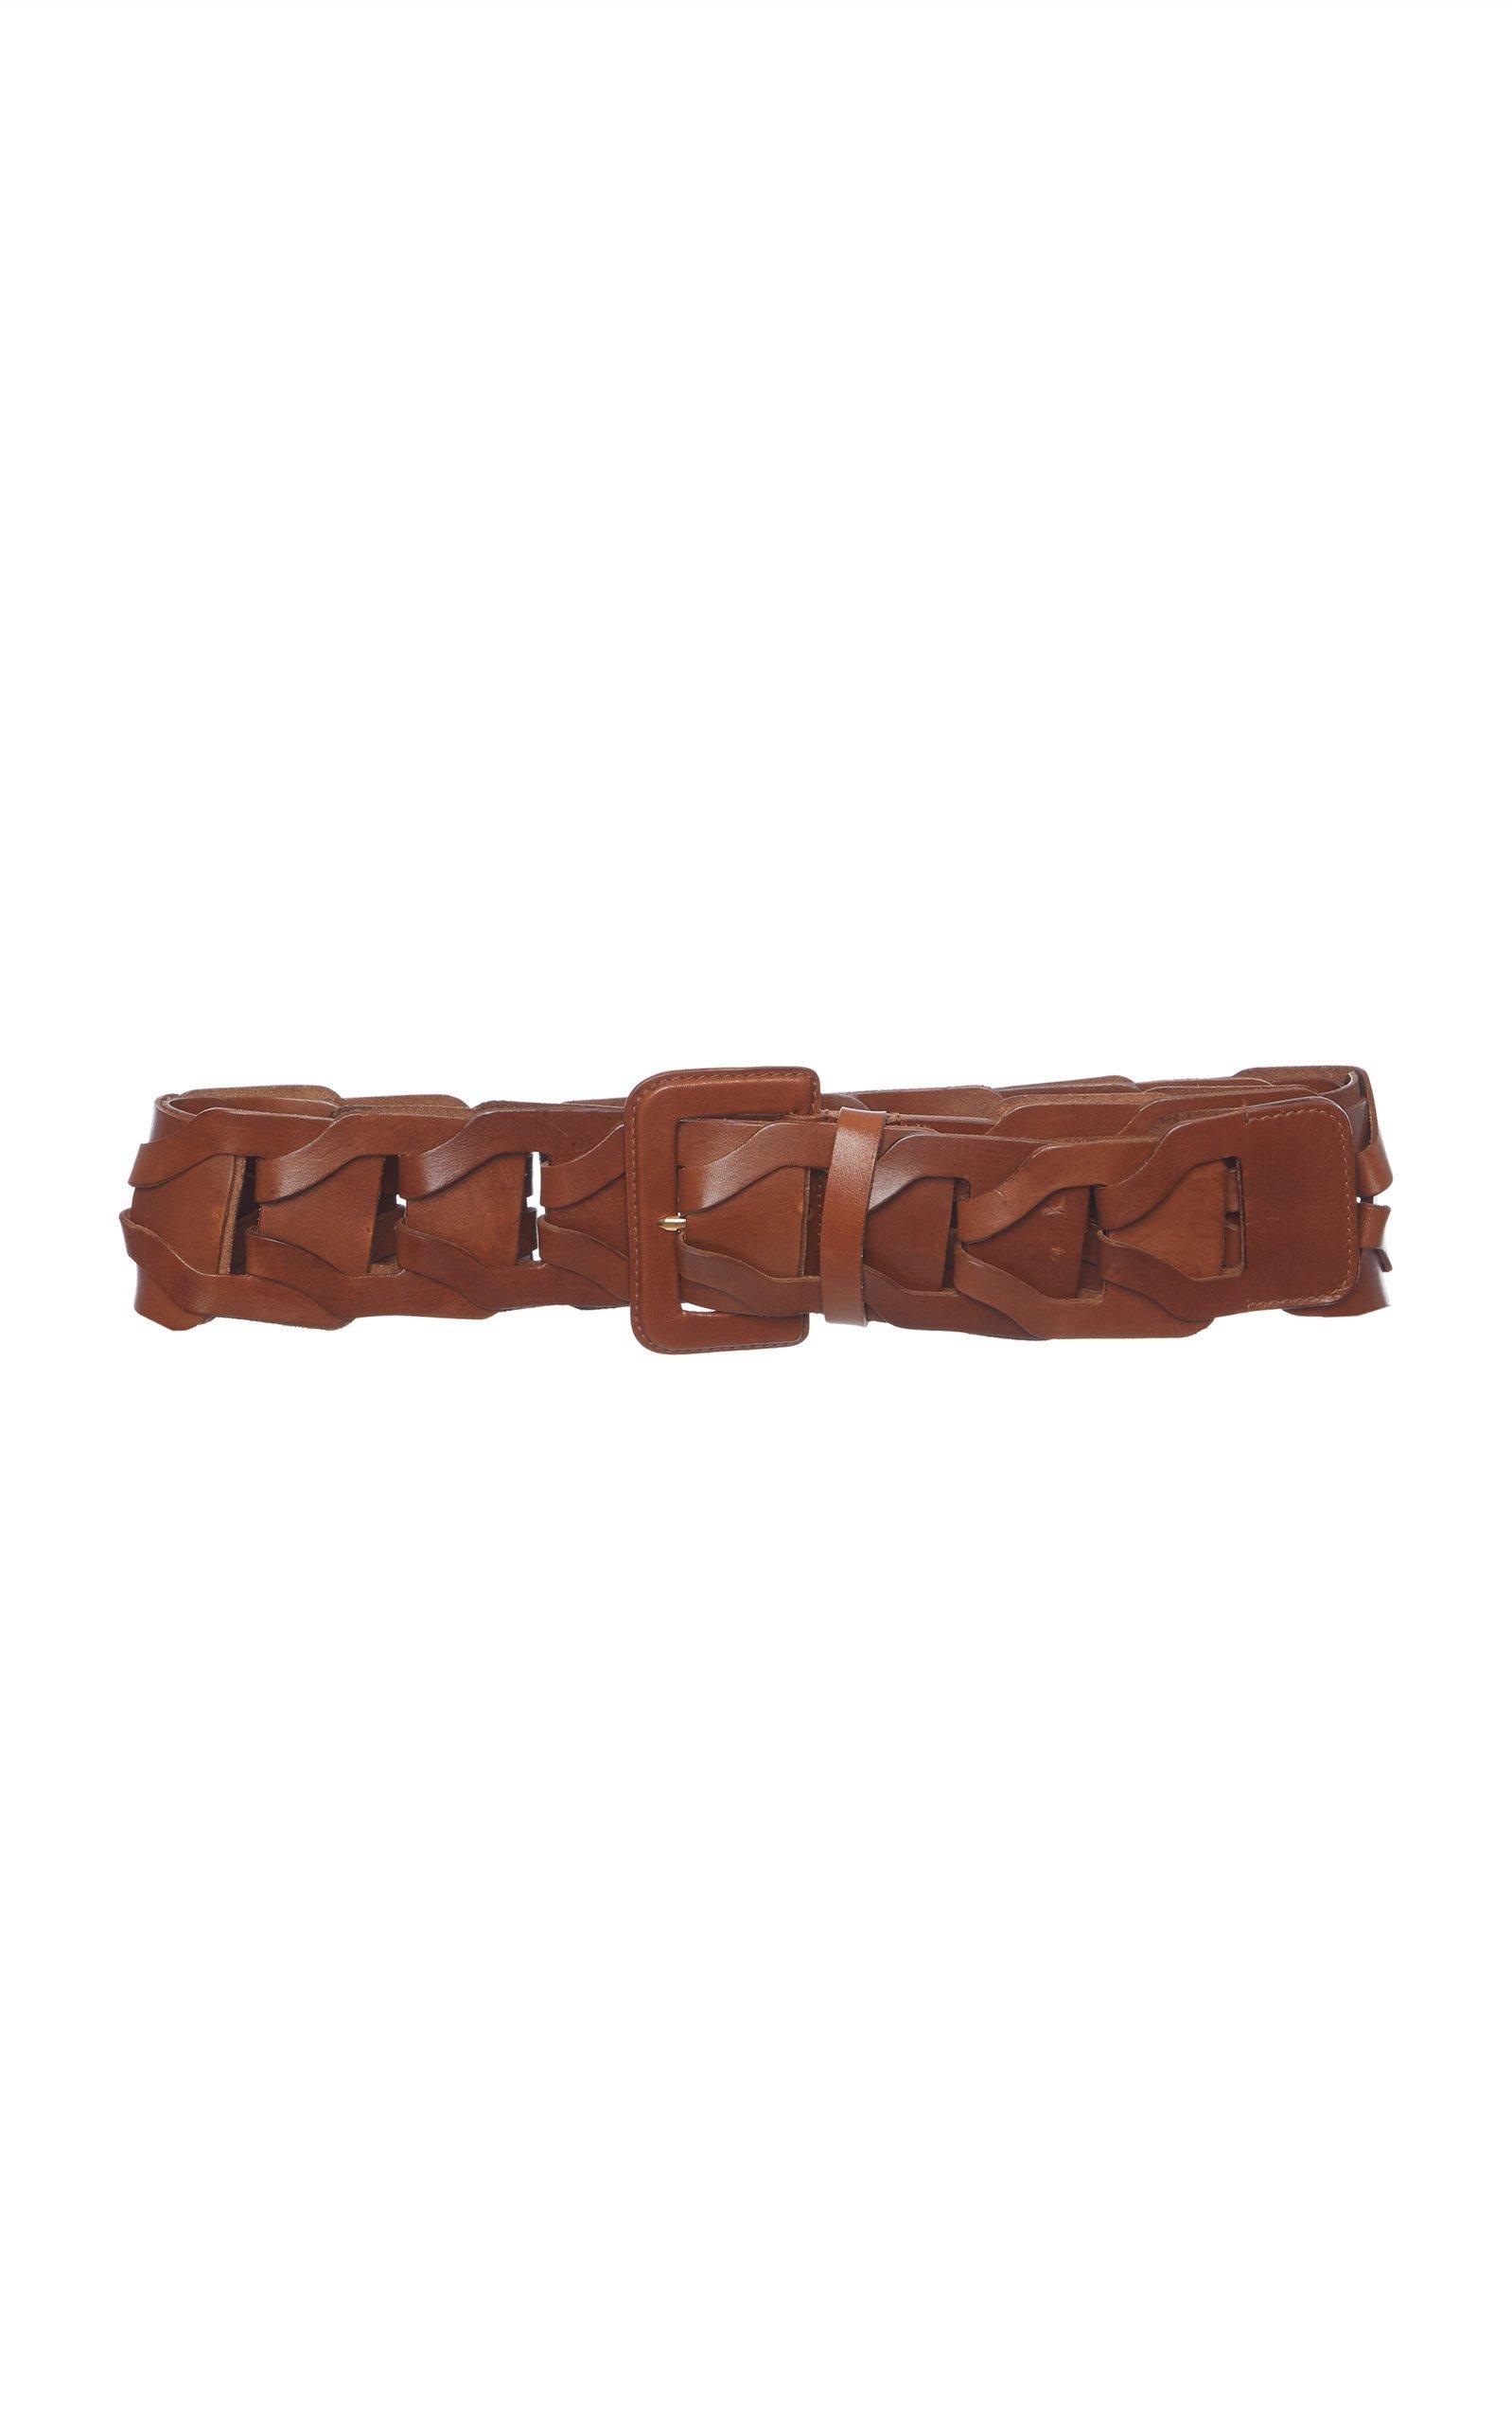 Prada Wide Woven Leather Belt Size: 80 cm